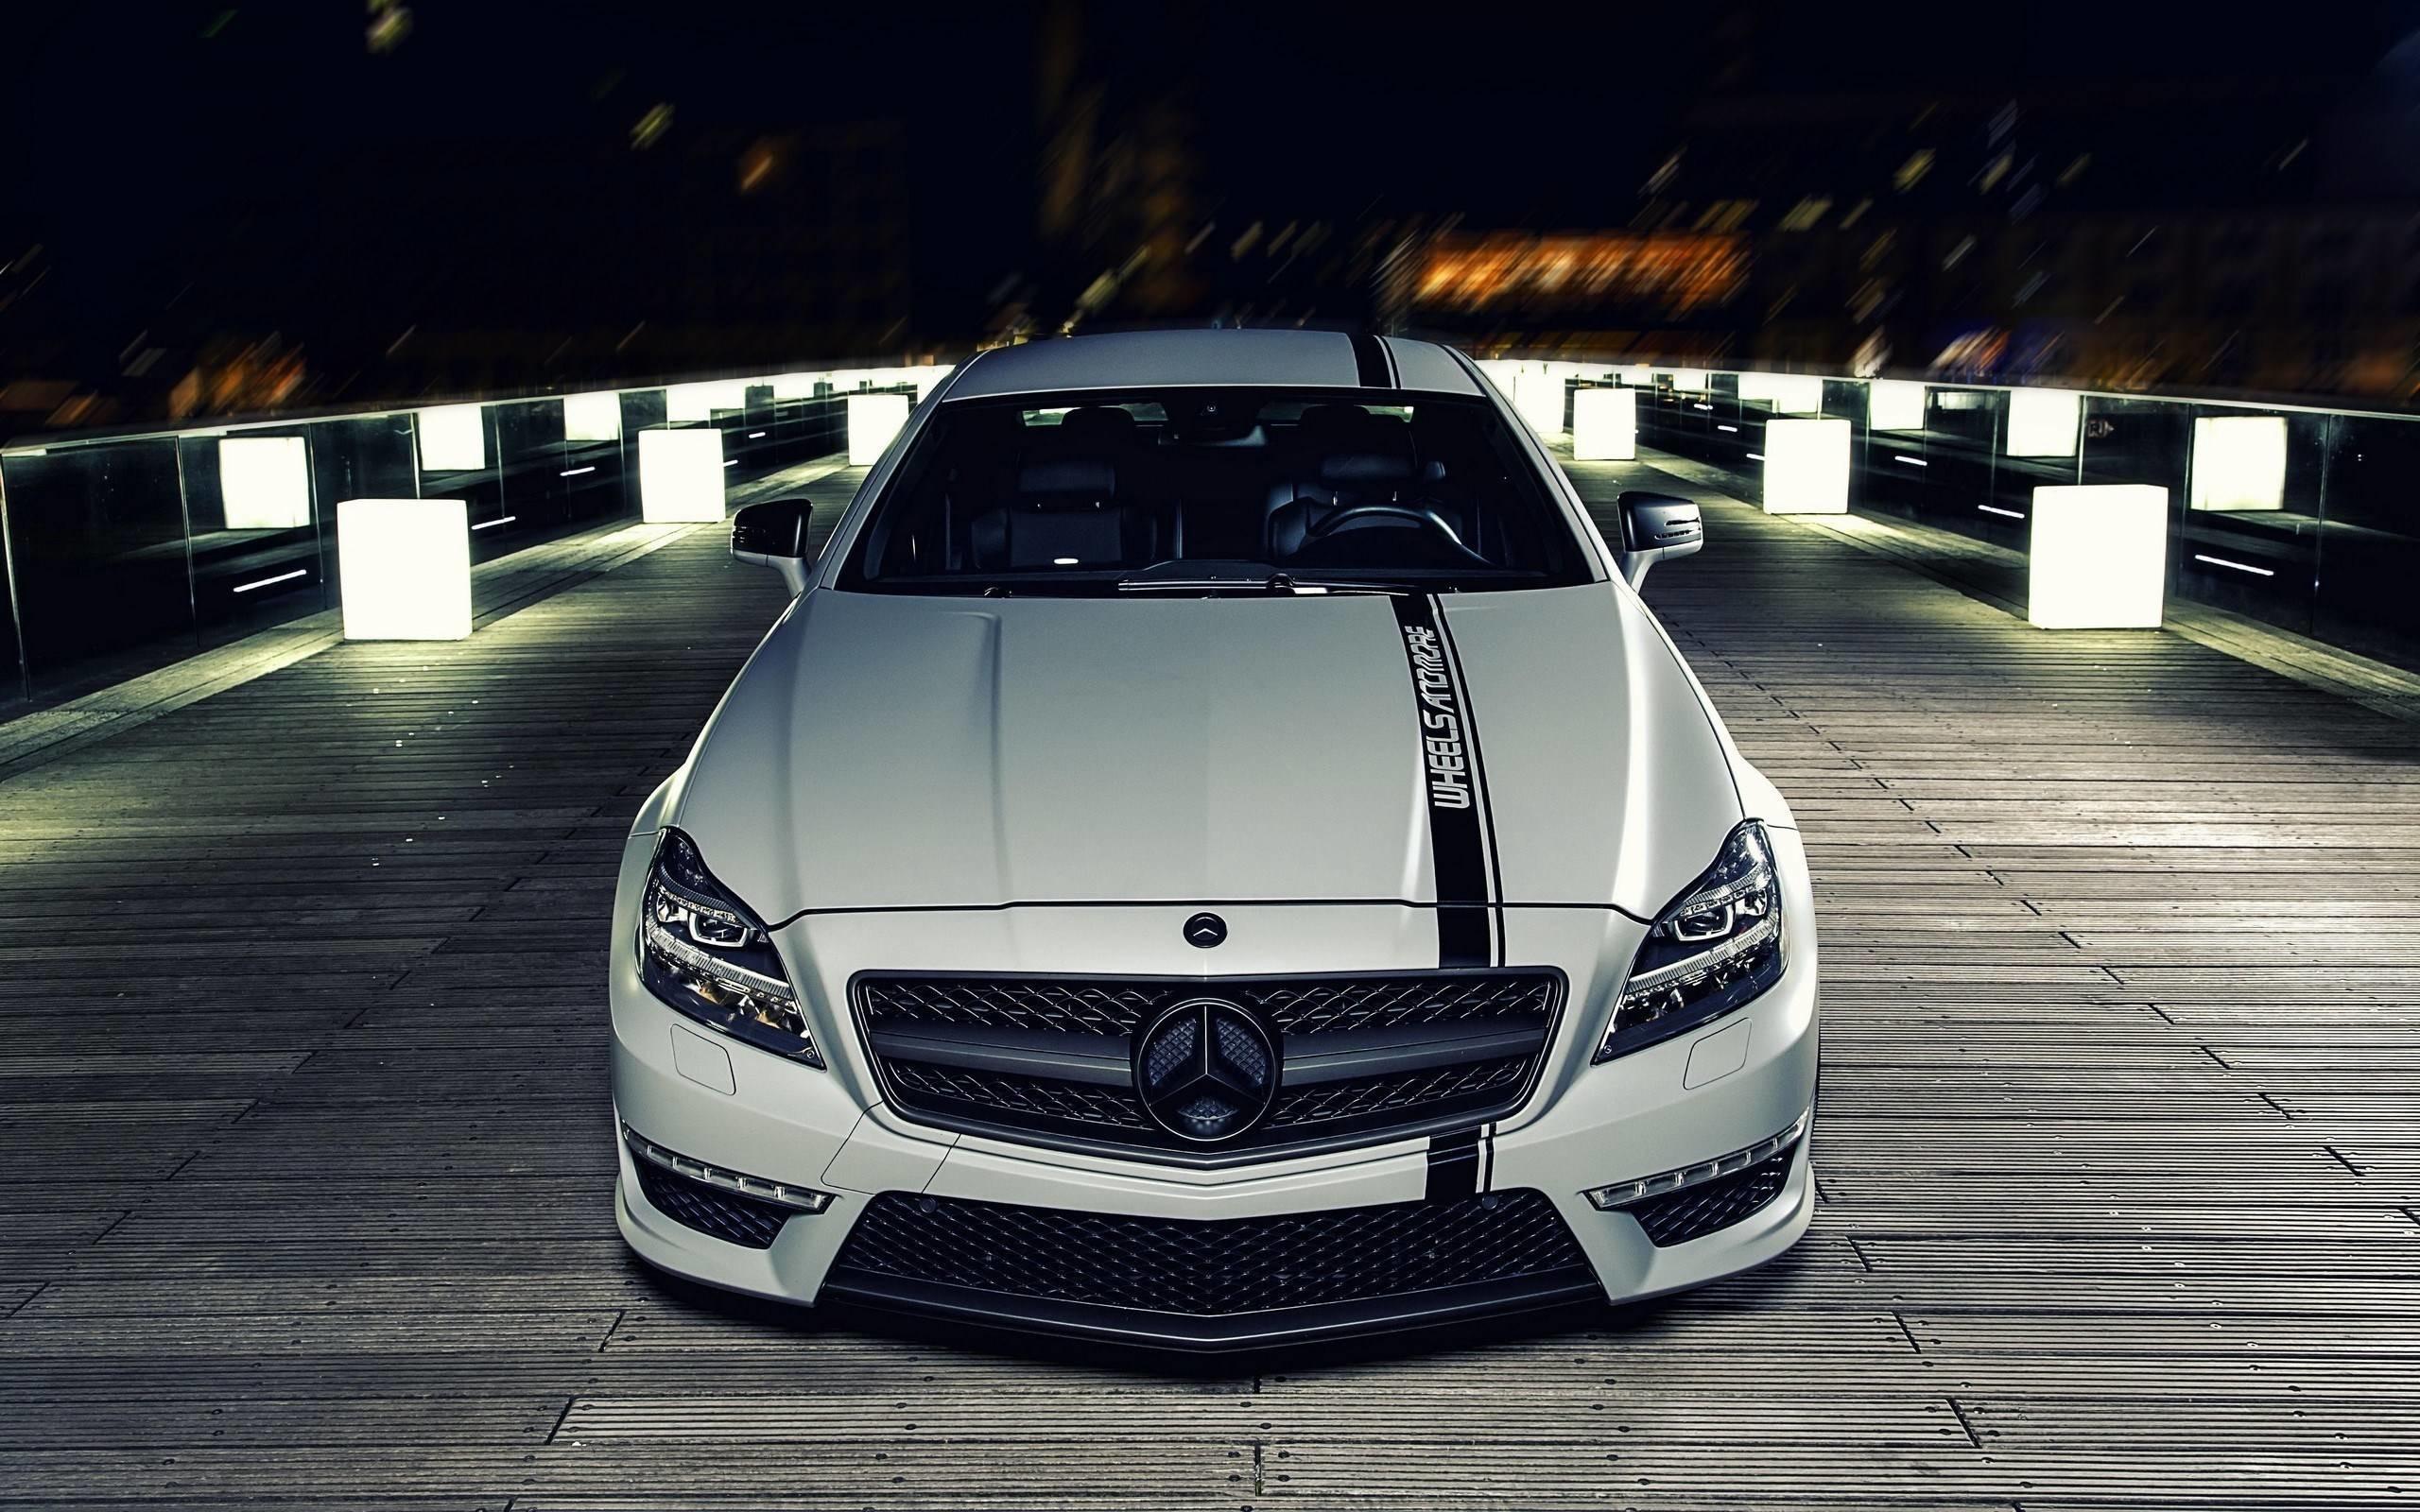 Mercedes Amg Wallpaper (78+ images)